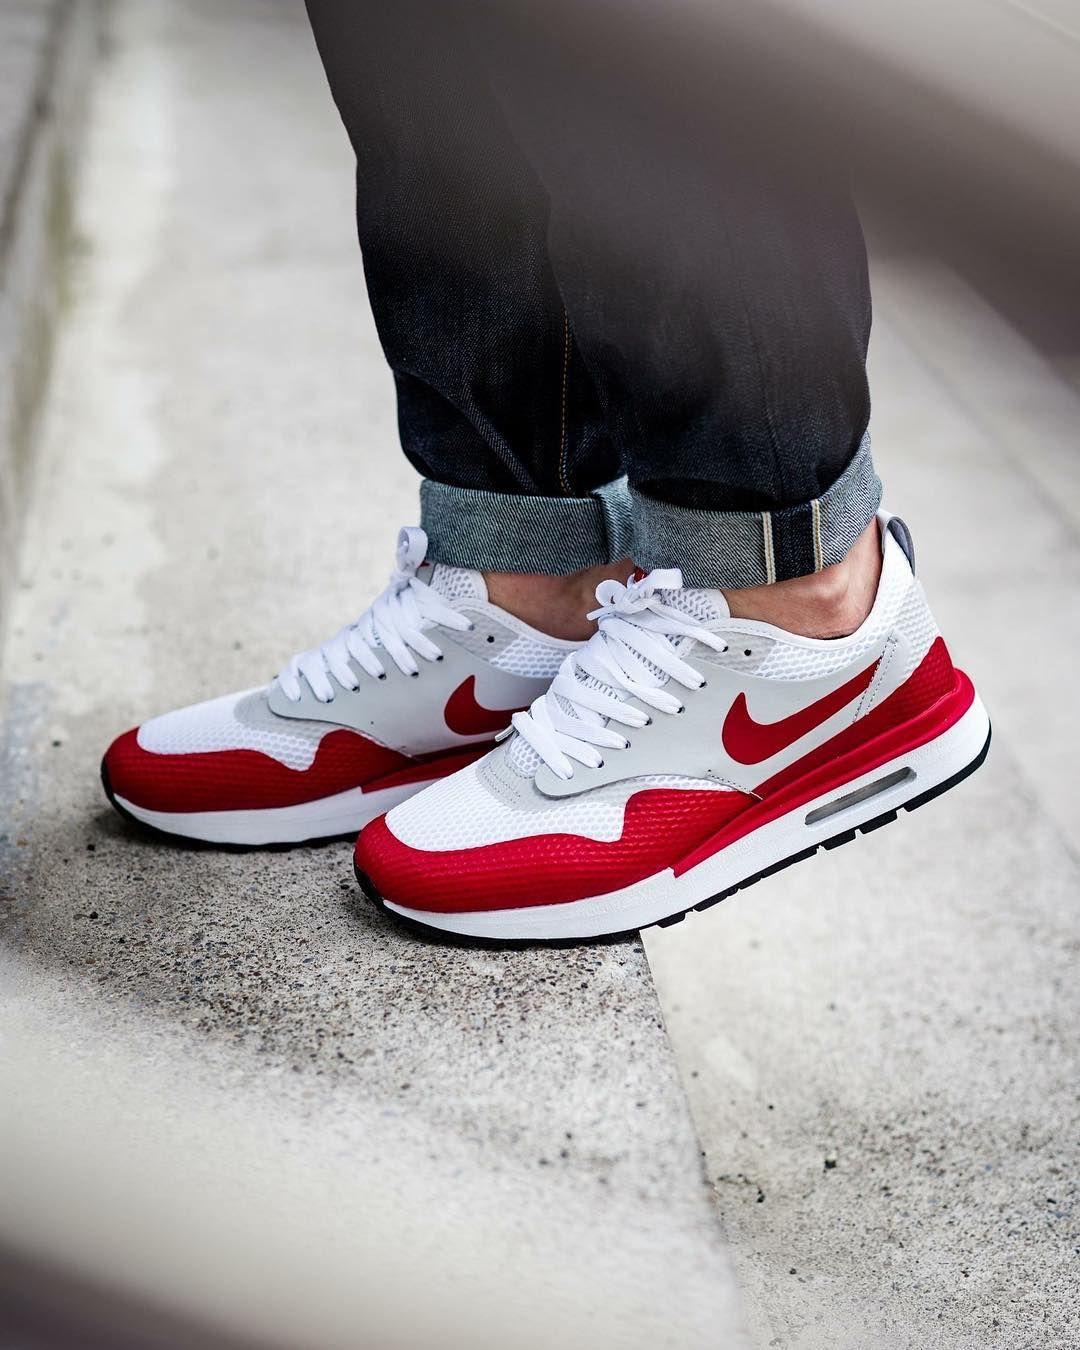 1564ab234692 Nike Air Max 1 x Royal OG Red